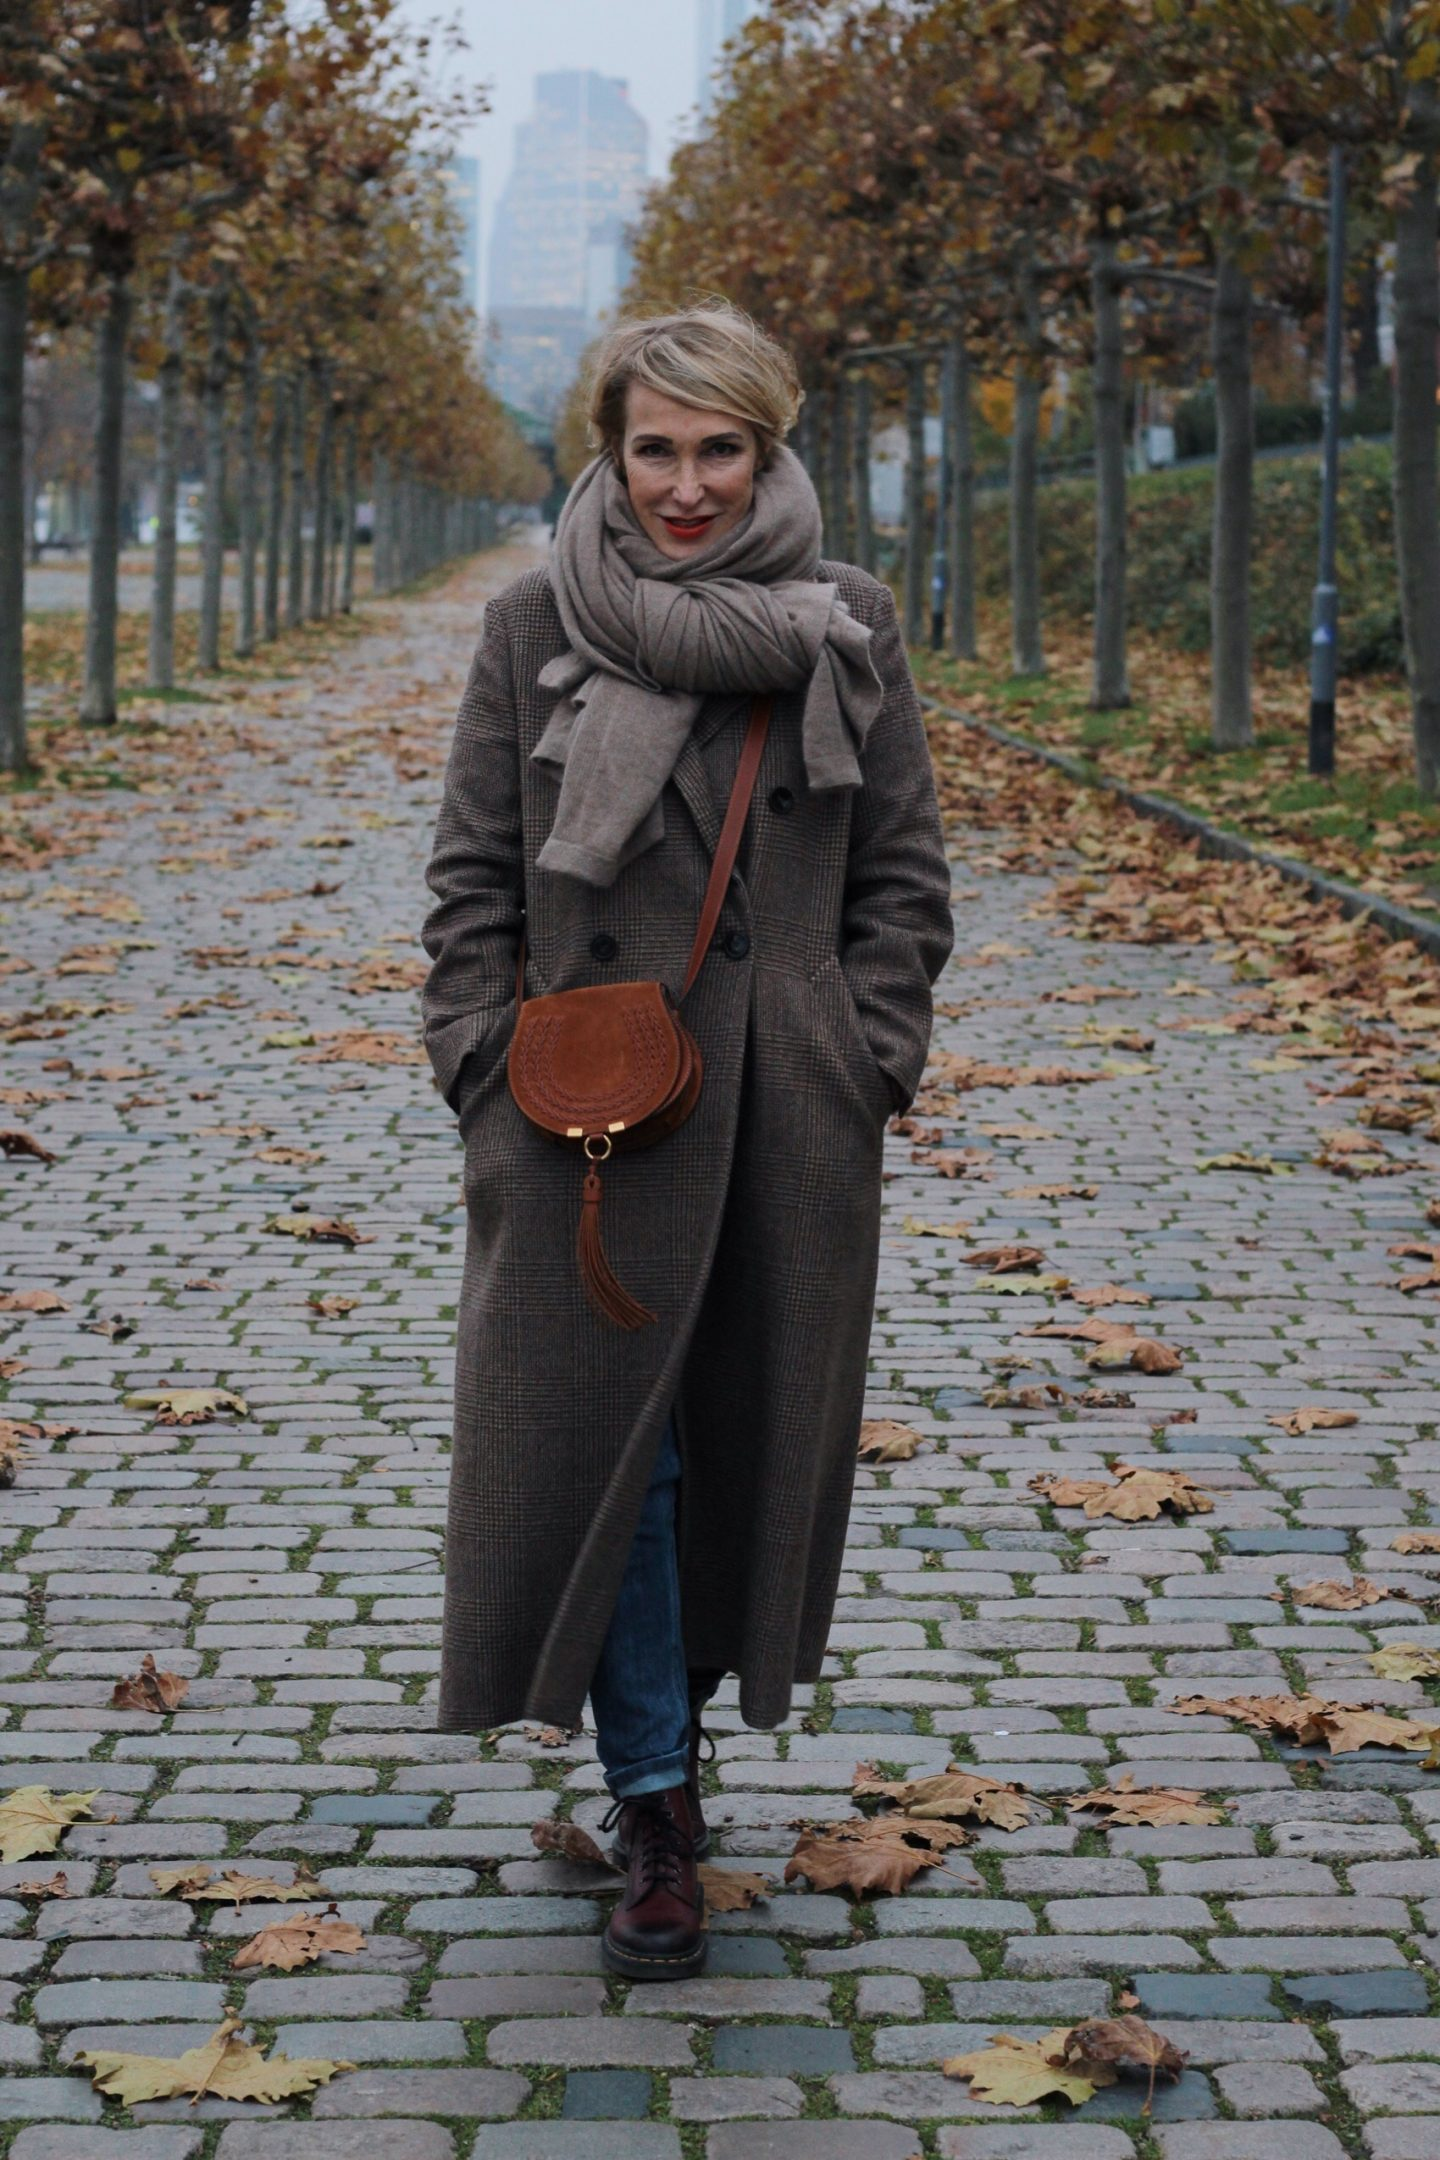 glamupyourlifestyle sale Max-Mara-Mantel Wintermantel ü-40-bloh ü-50-blog ue-40-blog ue-50-blog